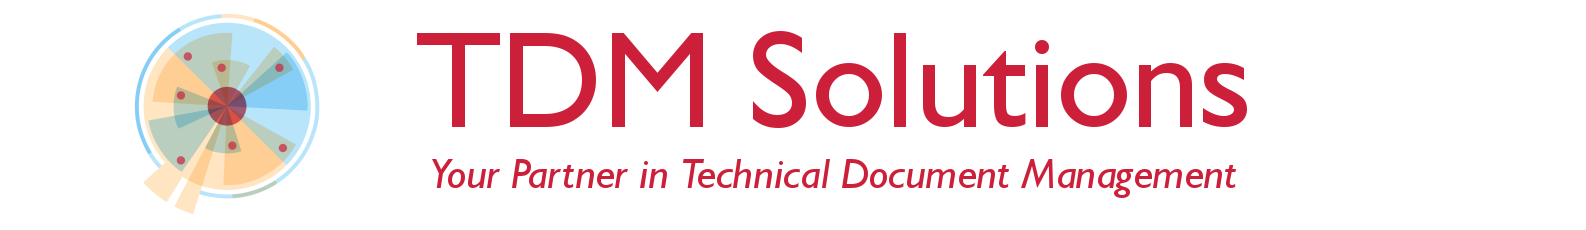 TDM Solutions